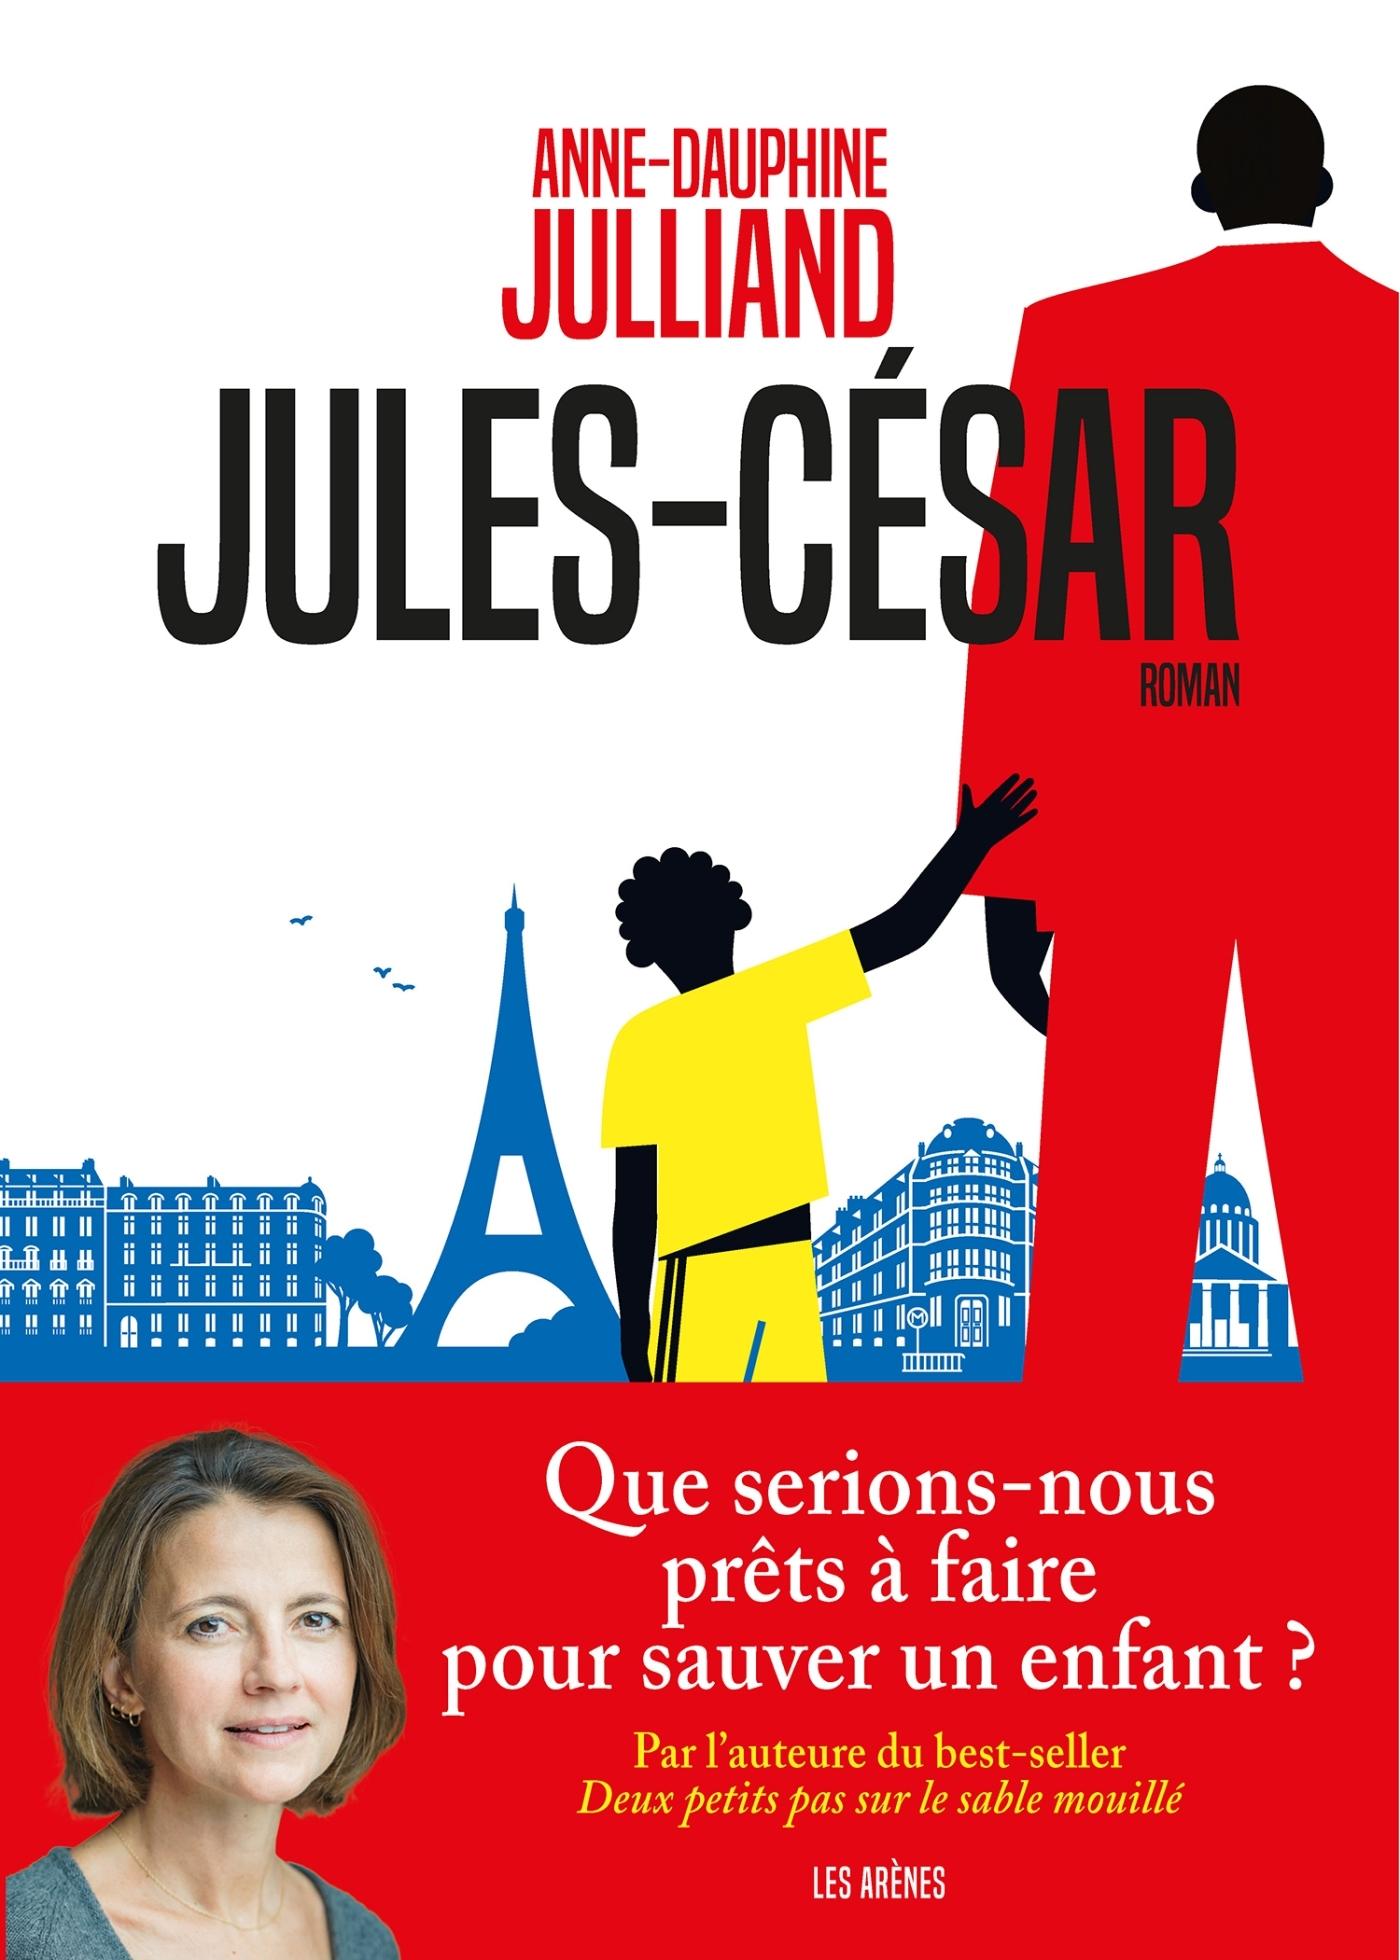 JULES-CESAR